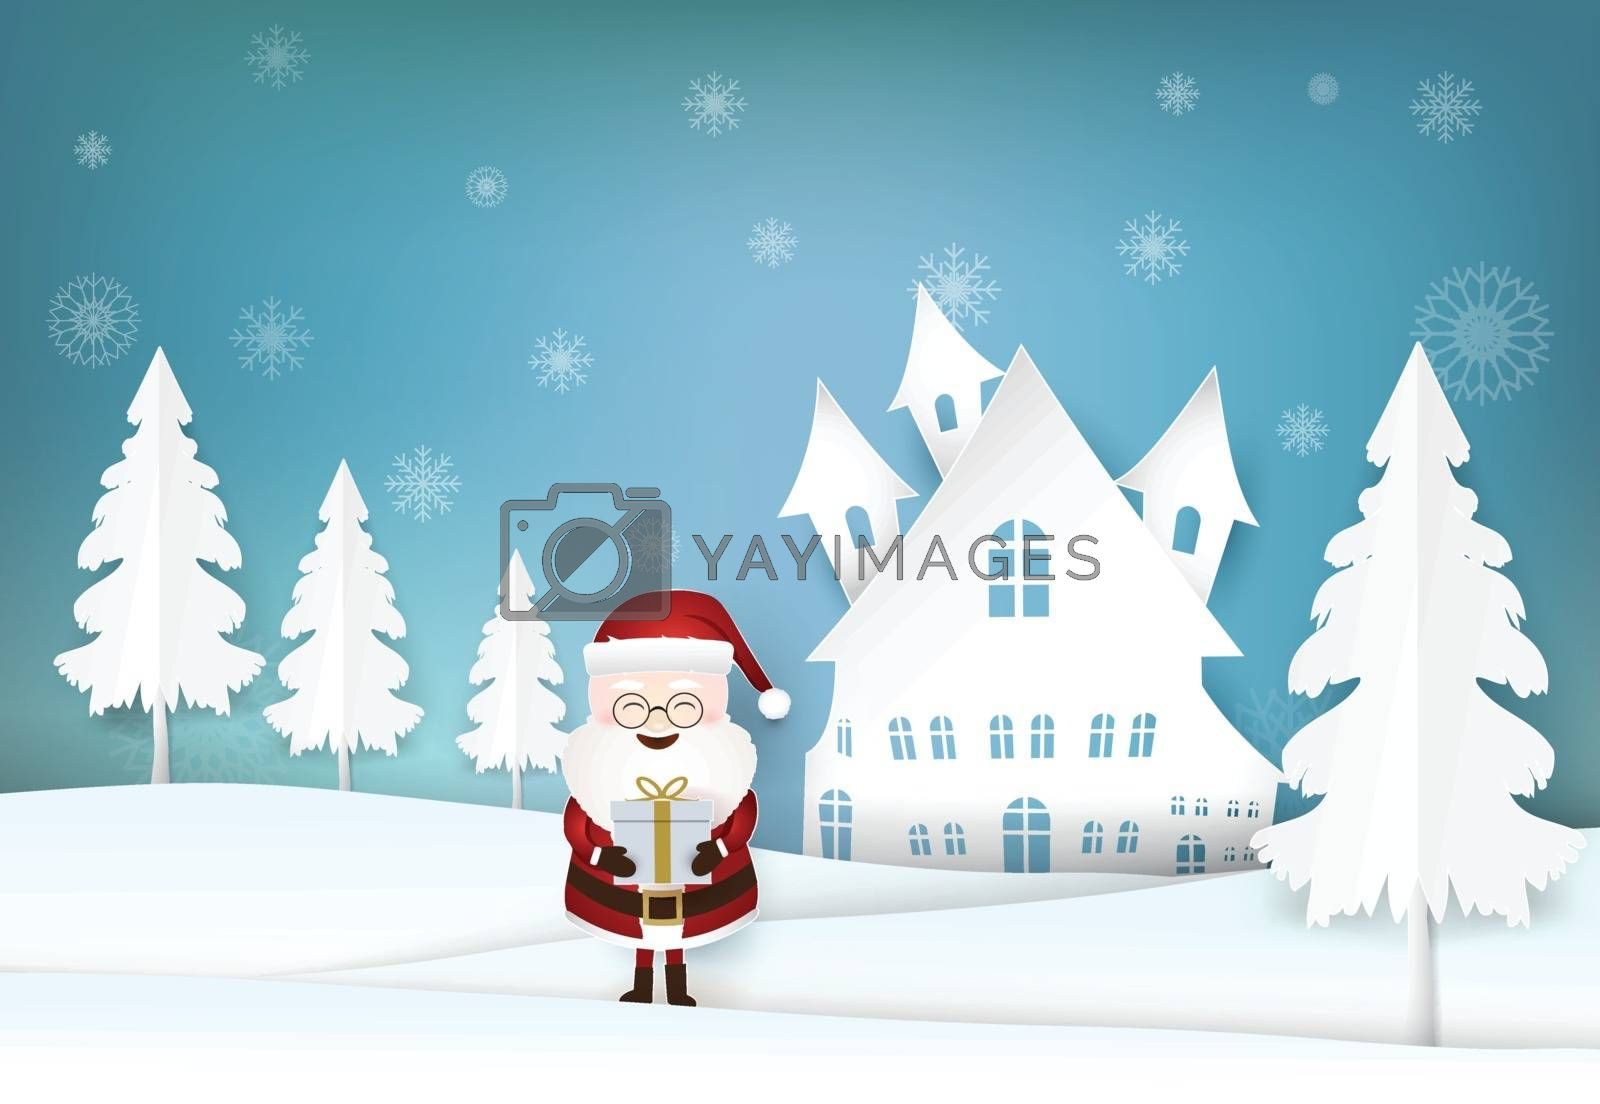 Christmas season Santa holding gift box and snowflake Winter holiday background paper art, paper craft style illustration.